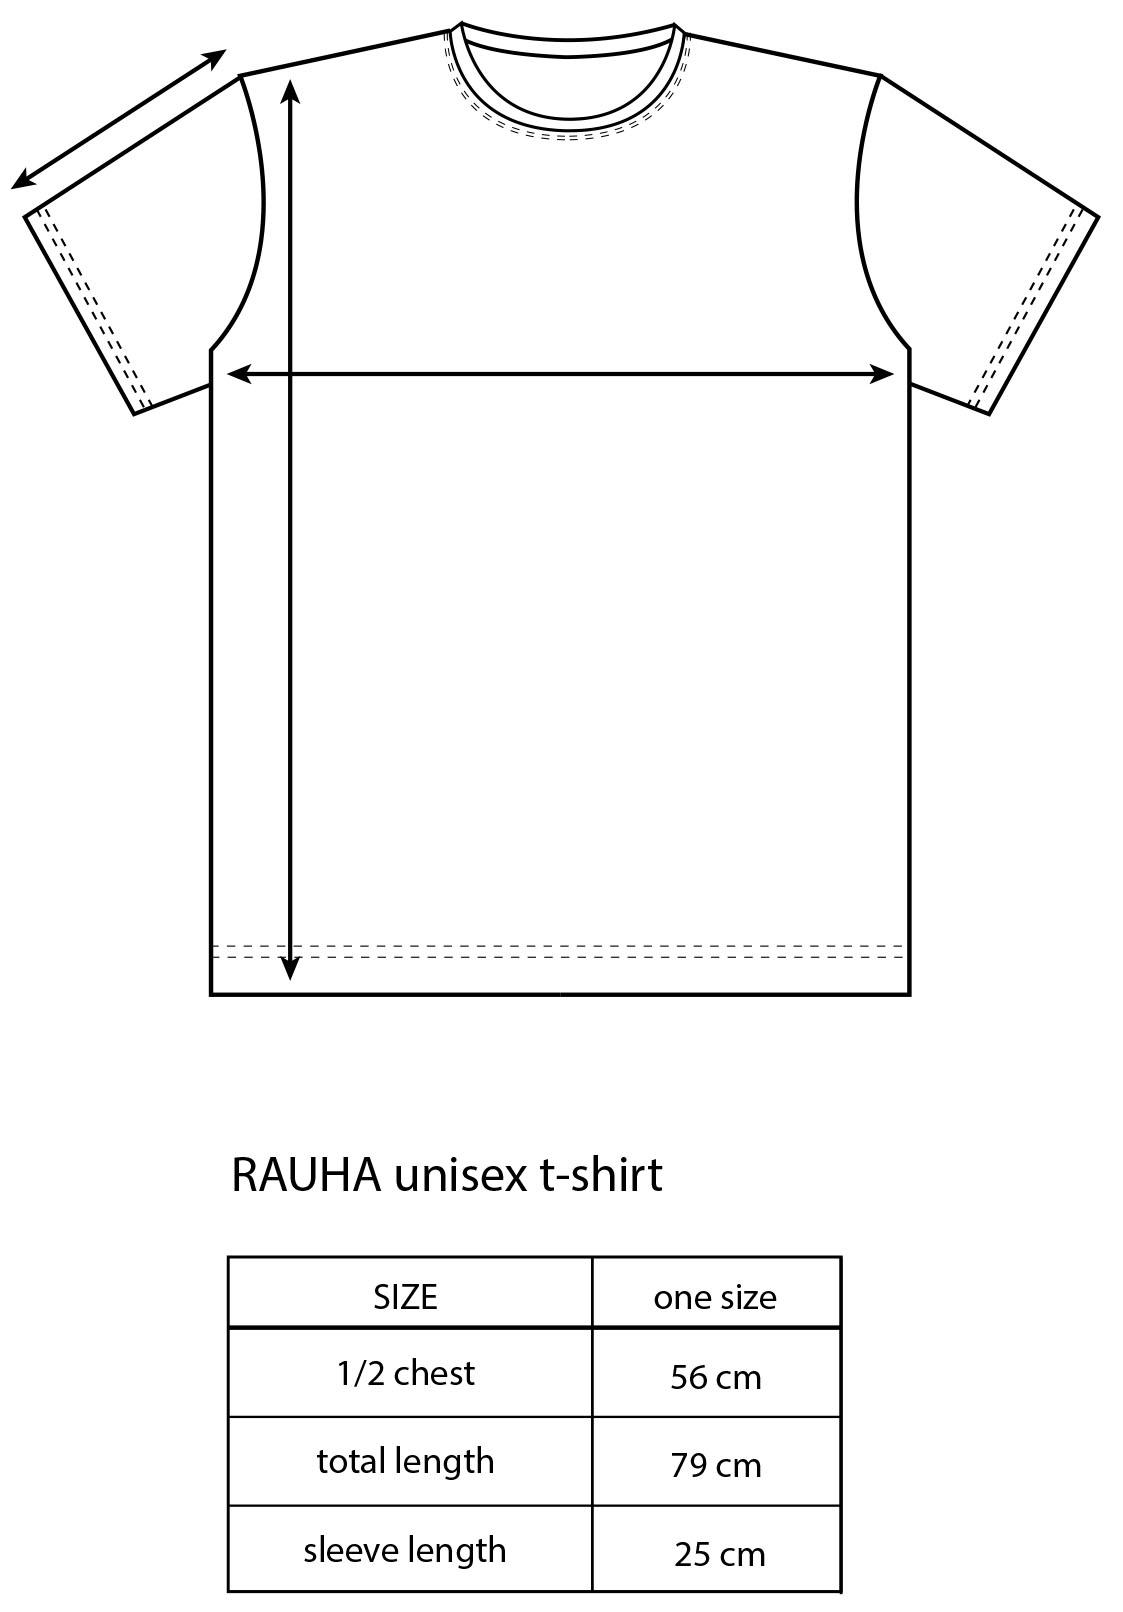 4e409cd2b Vimma T-shirt Unisex RAUHA one-colored black Onesize - black, one-